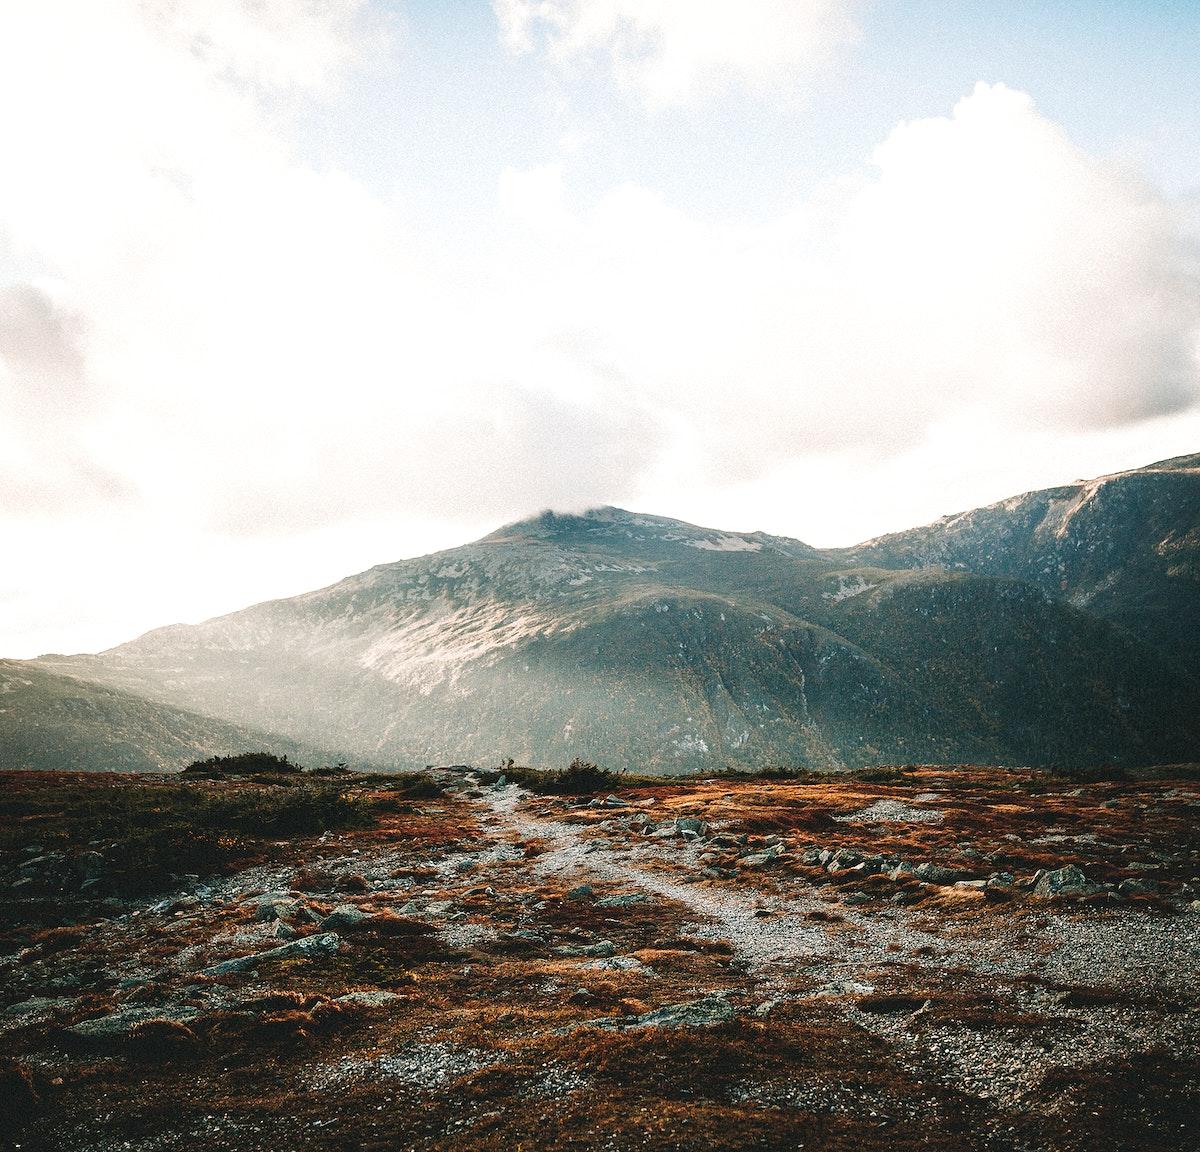 Sunlight over Mount Washington in New Hampshire, USA